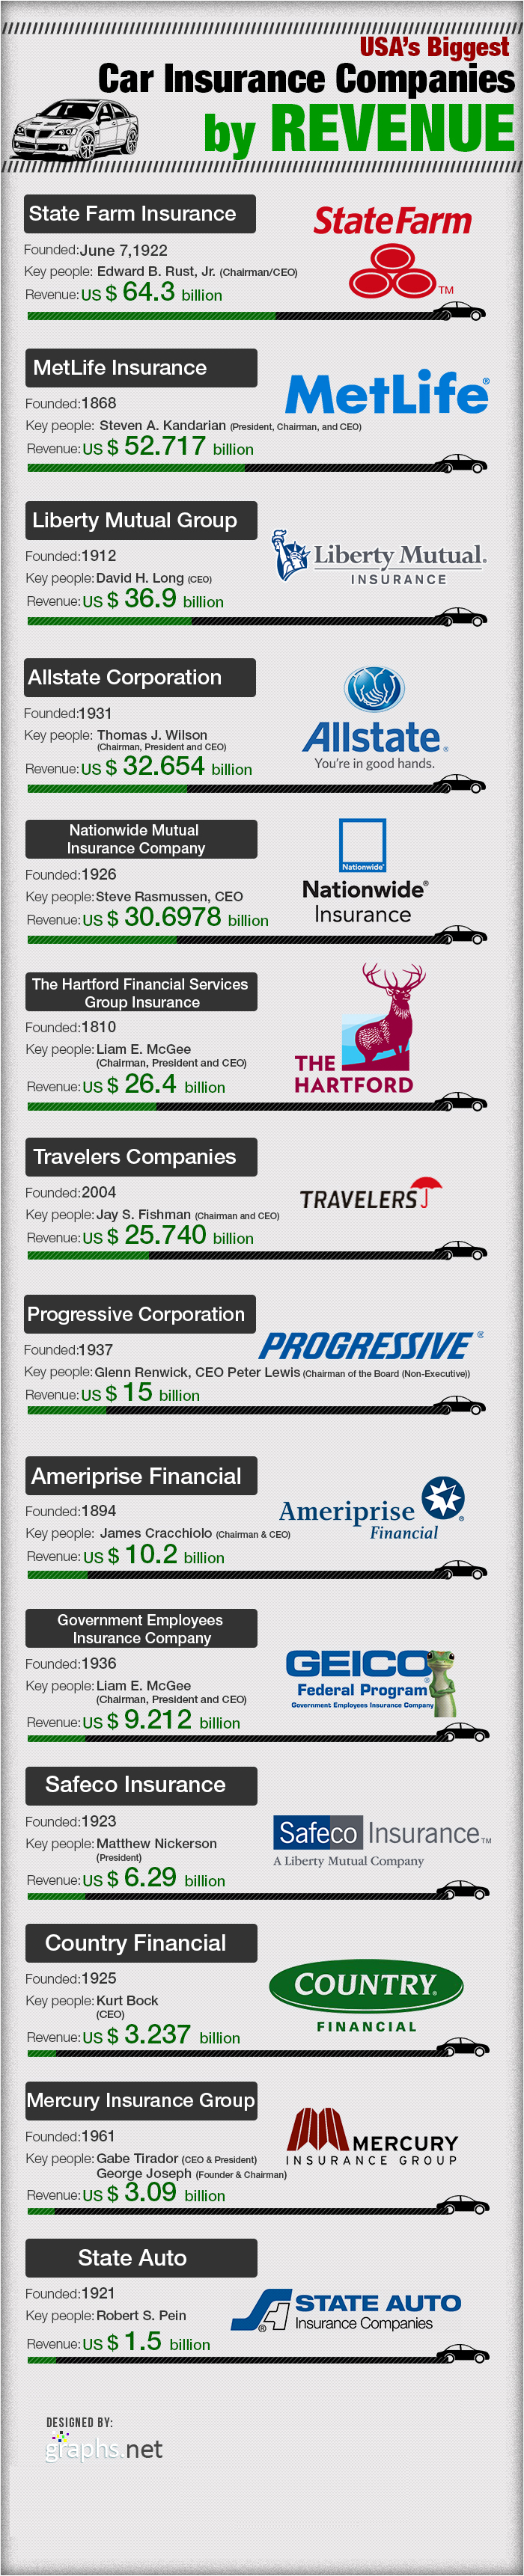 Biggest Car Insurance Companies